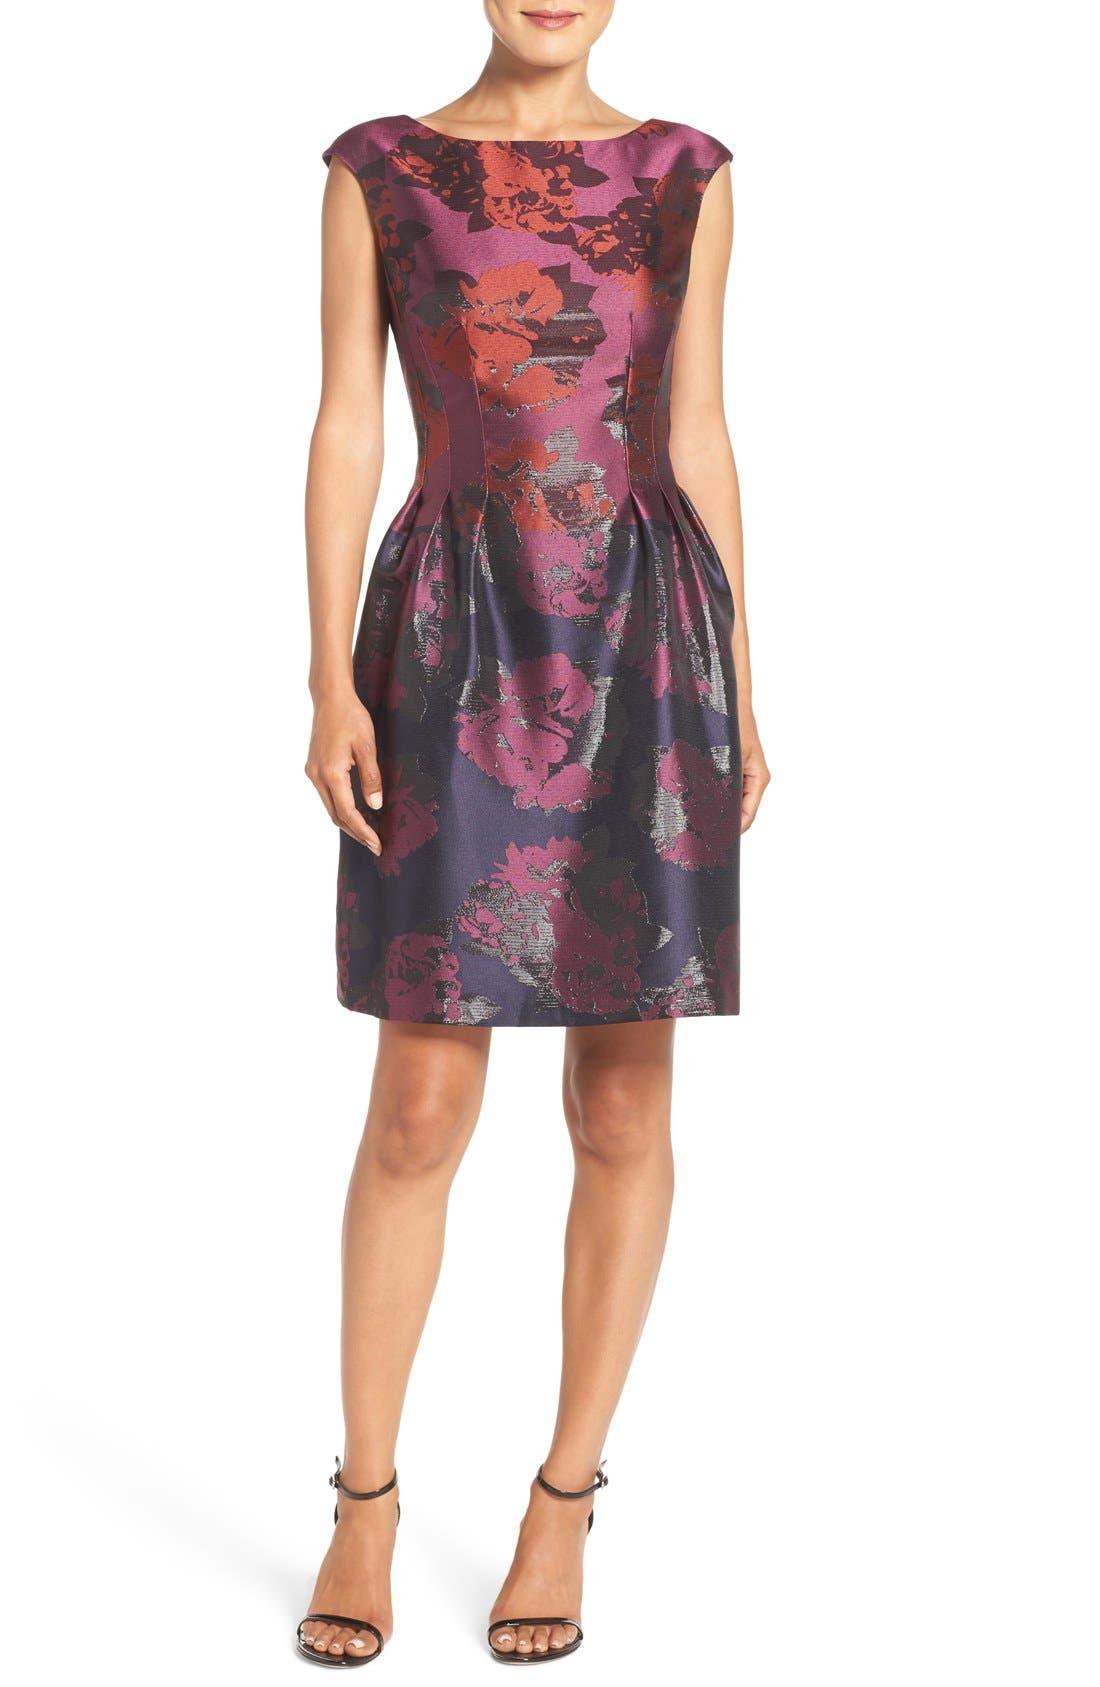 Alternate Image 1 Selected - Vince Camuto Jacquard Fit & Flare Dress (Regular & Petite)